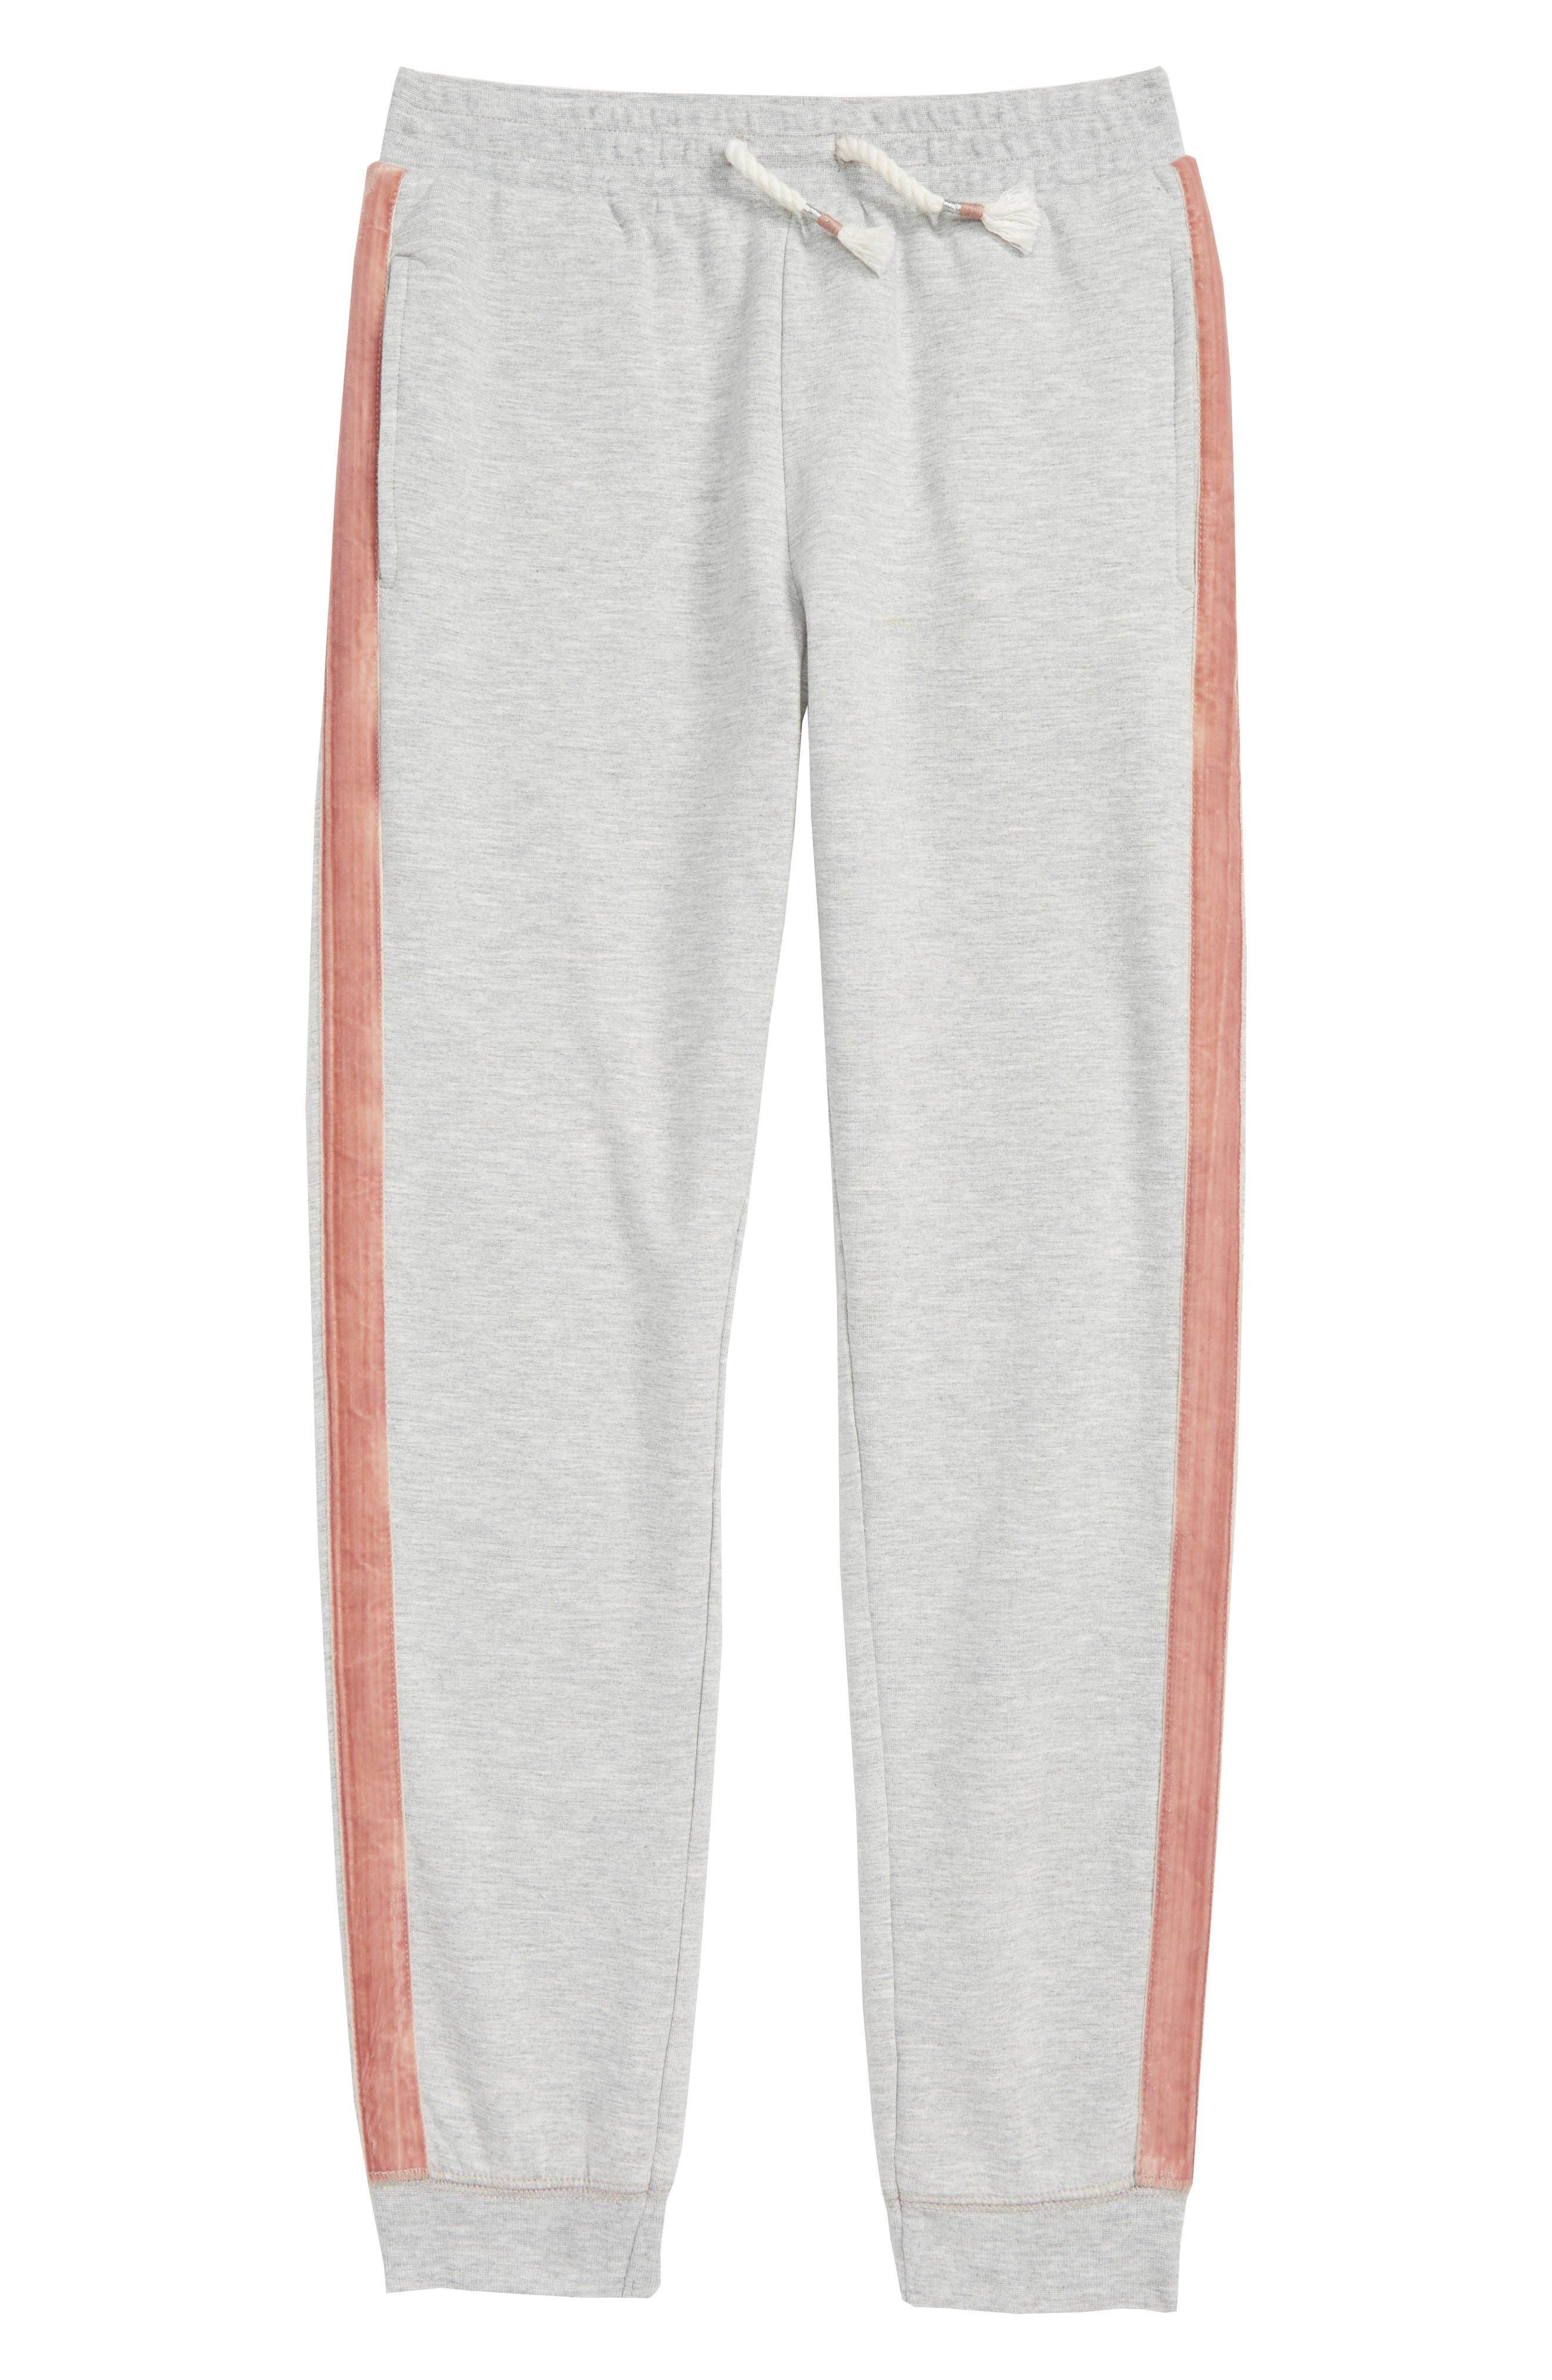 Girls Peek Maliyeah Jogger Pants